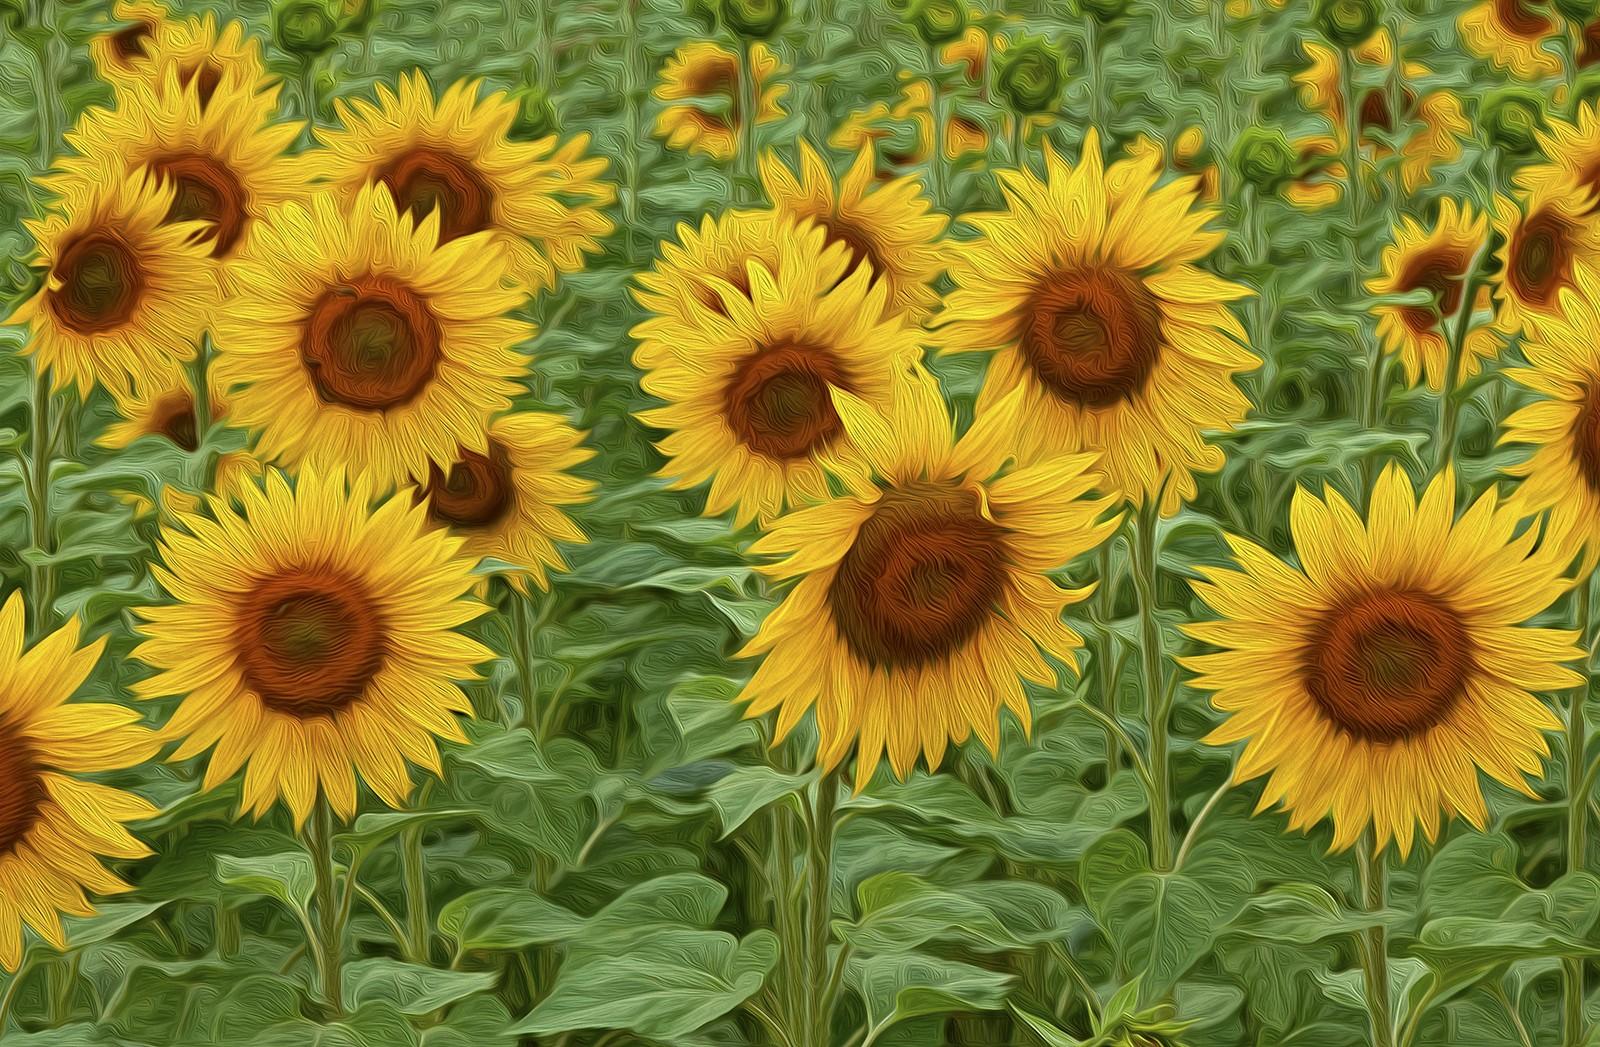 Painted Sunflowers.jpg